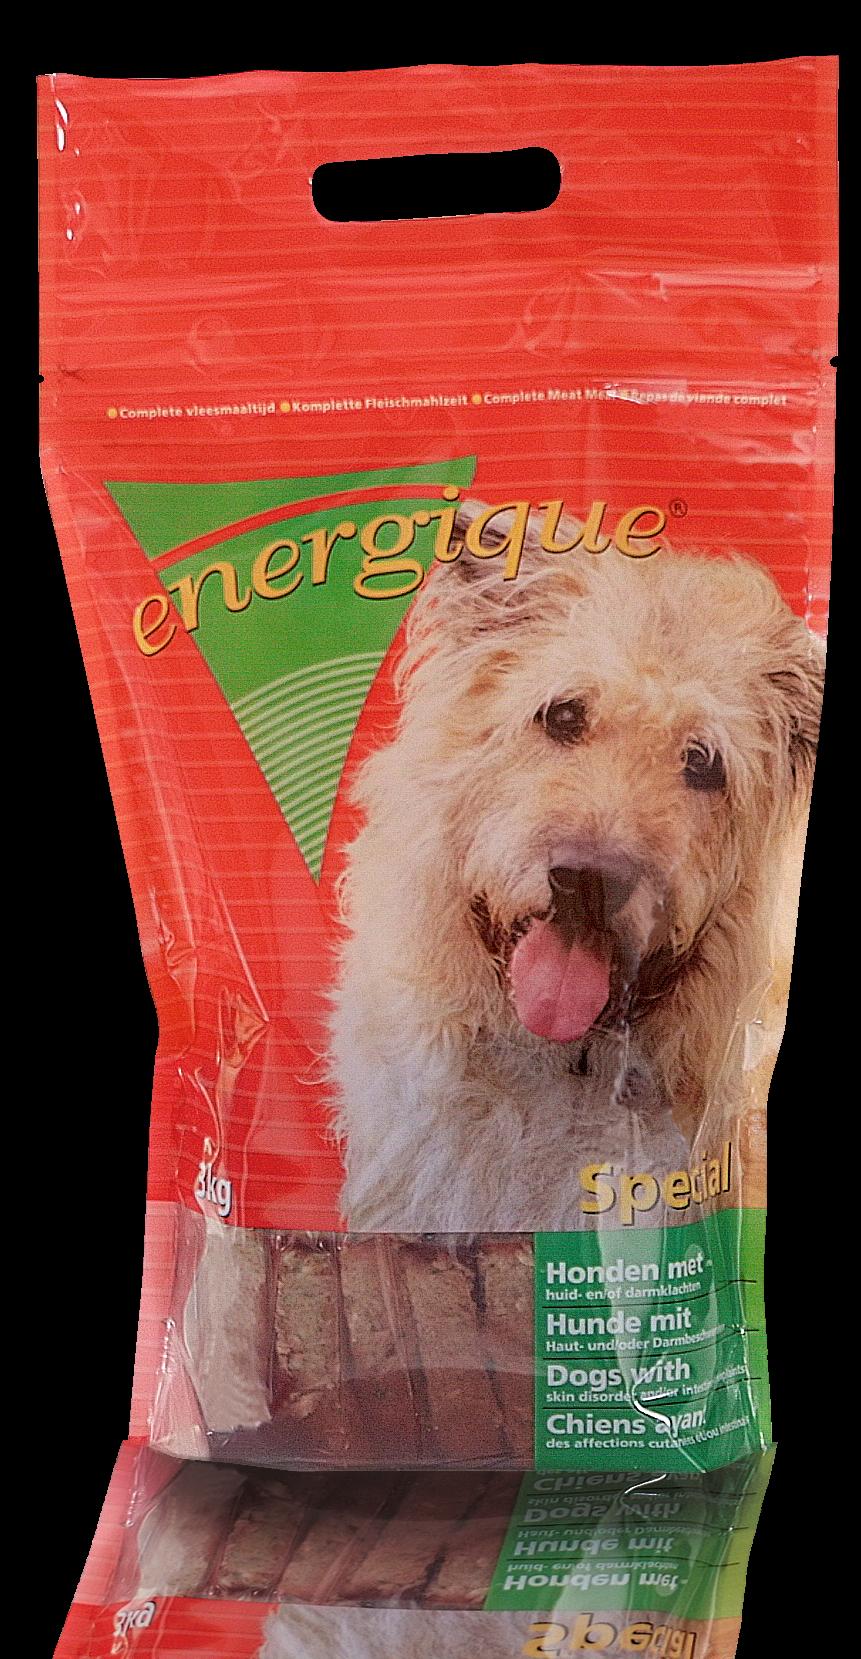 Energique hondenvoer Speciaal 4 - 3 kg